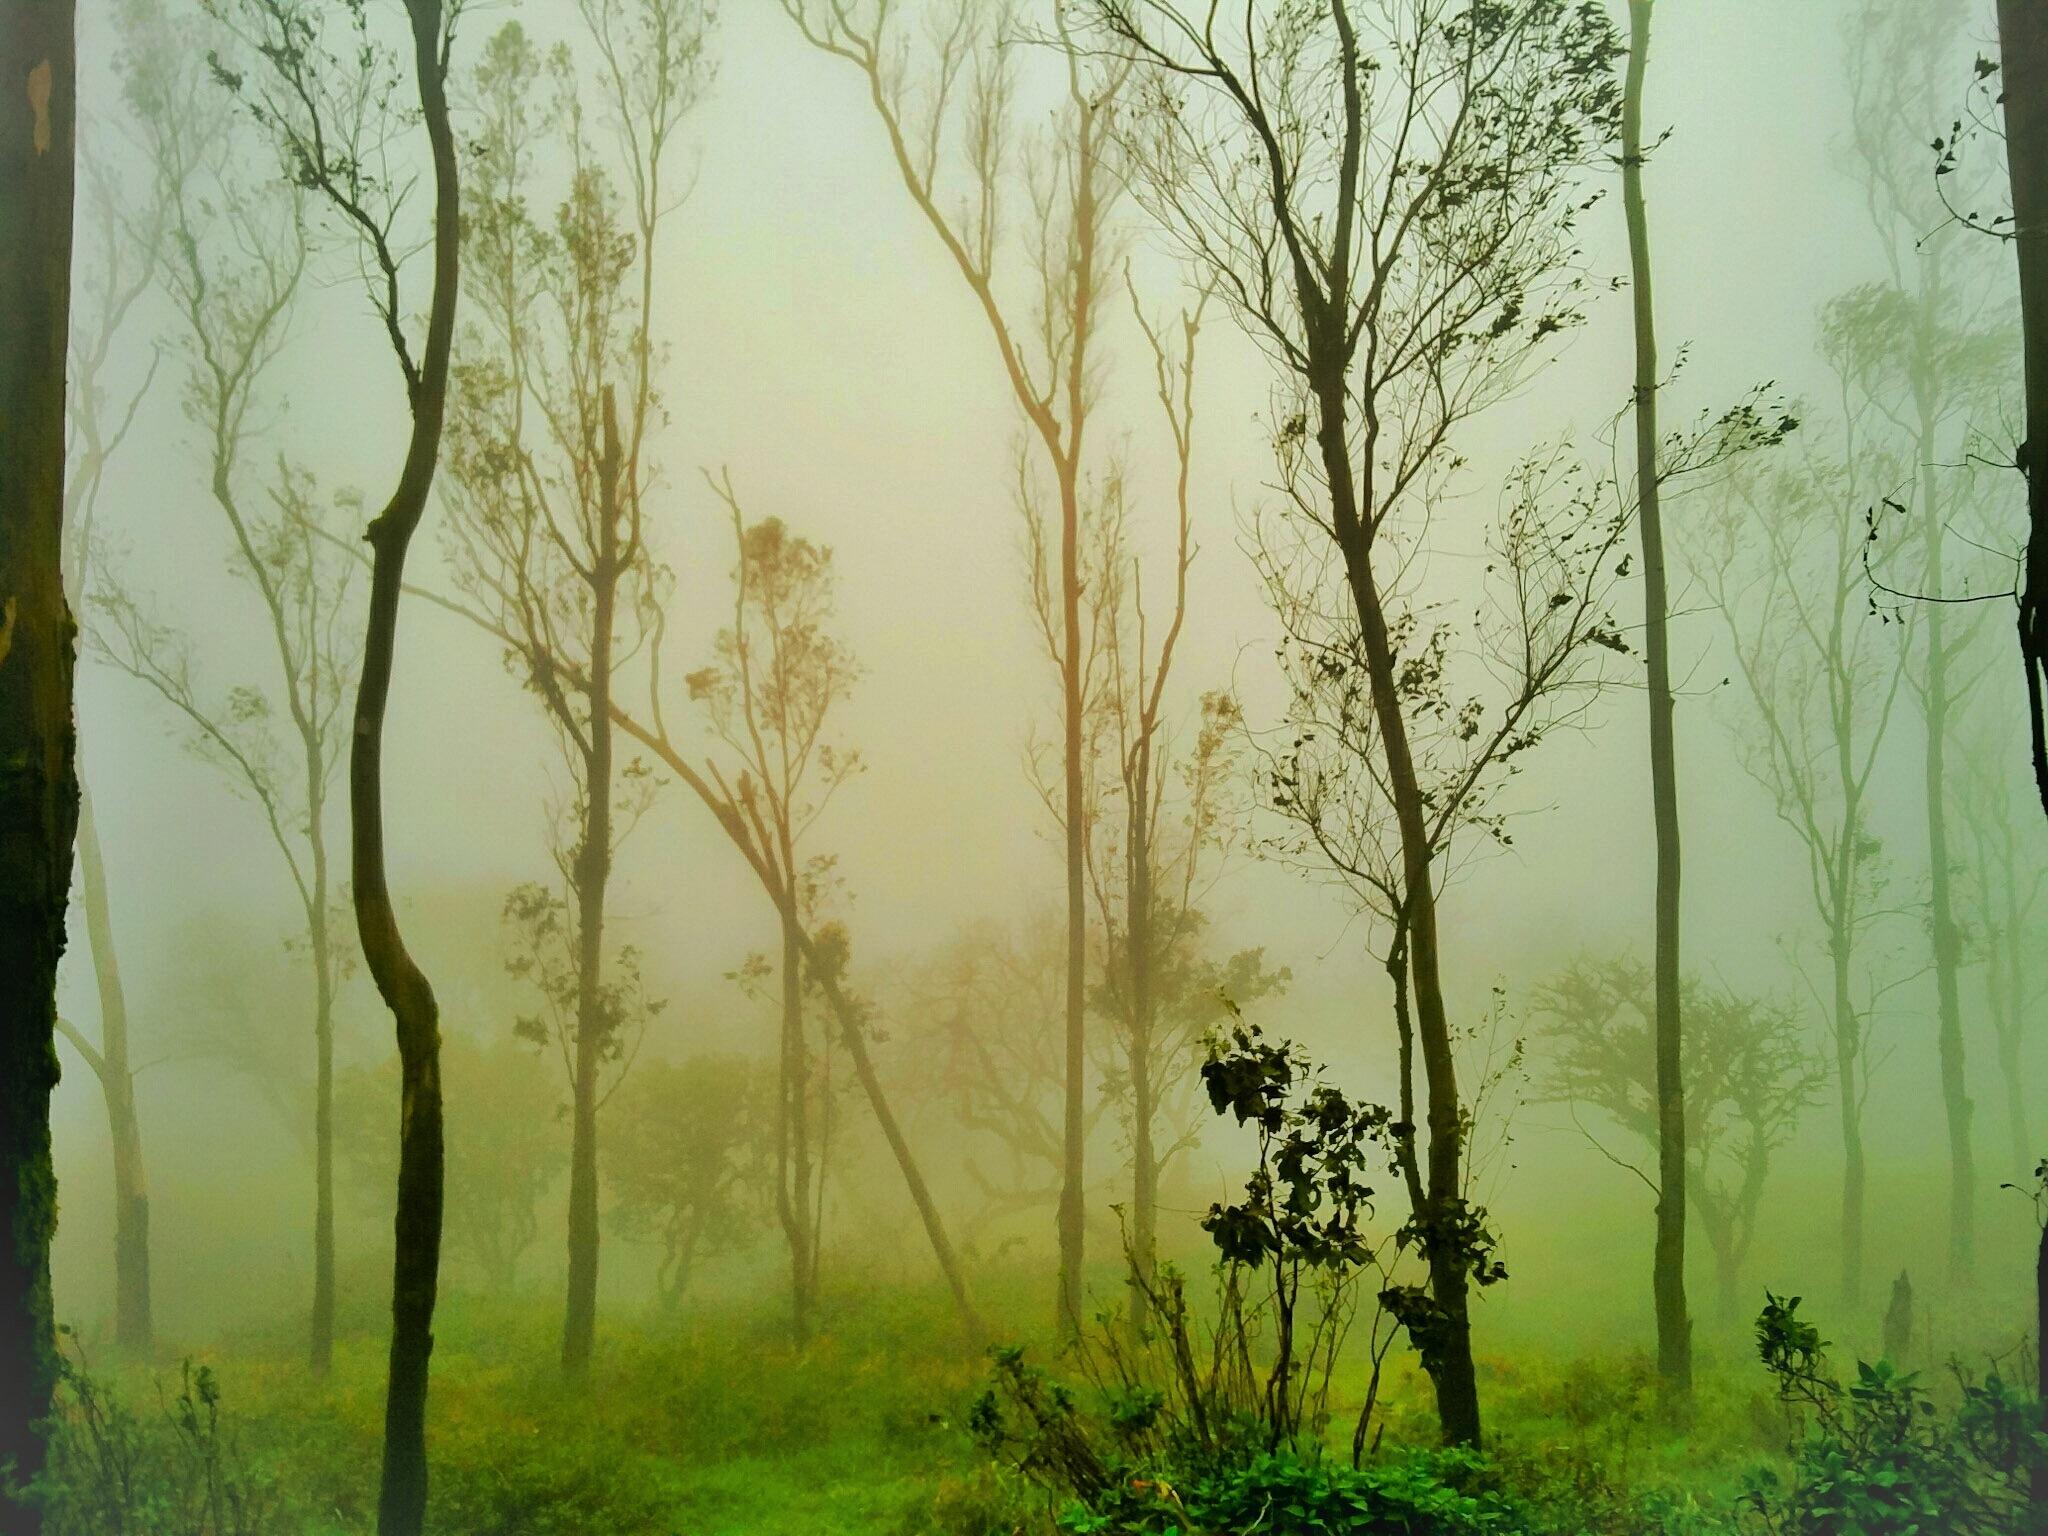 Nature by Pradeep Karthik